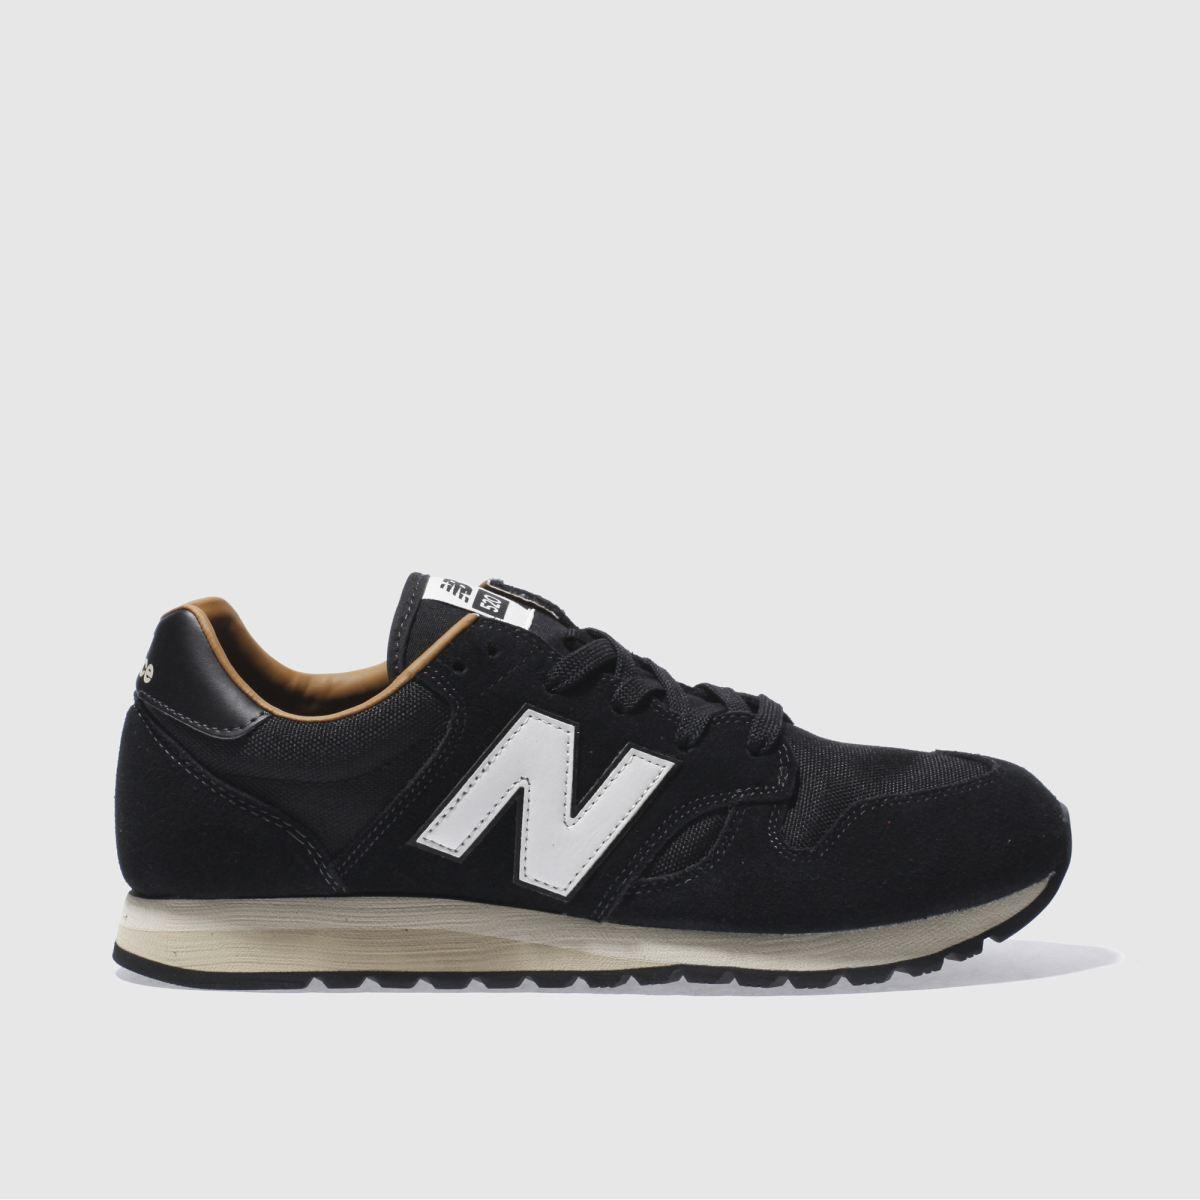 new balance black & white 520 trainers